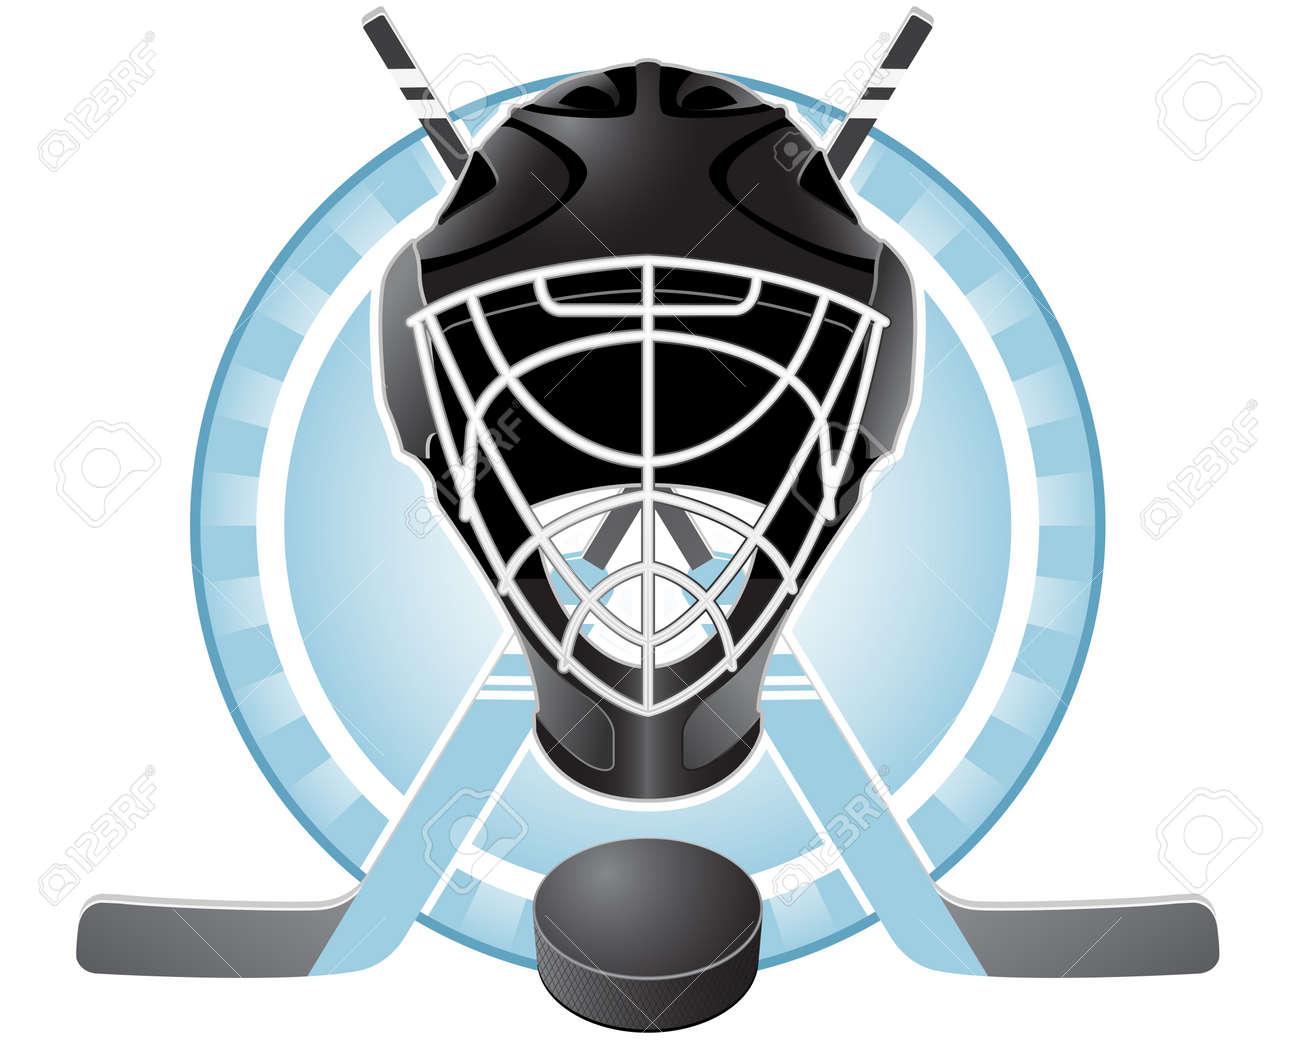 Emblem With Goaltender Helmet Hockey Sticks And Puck Royalty Free